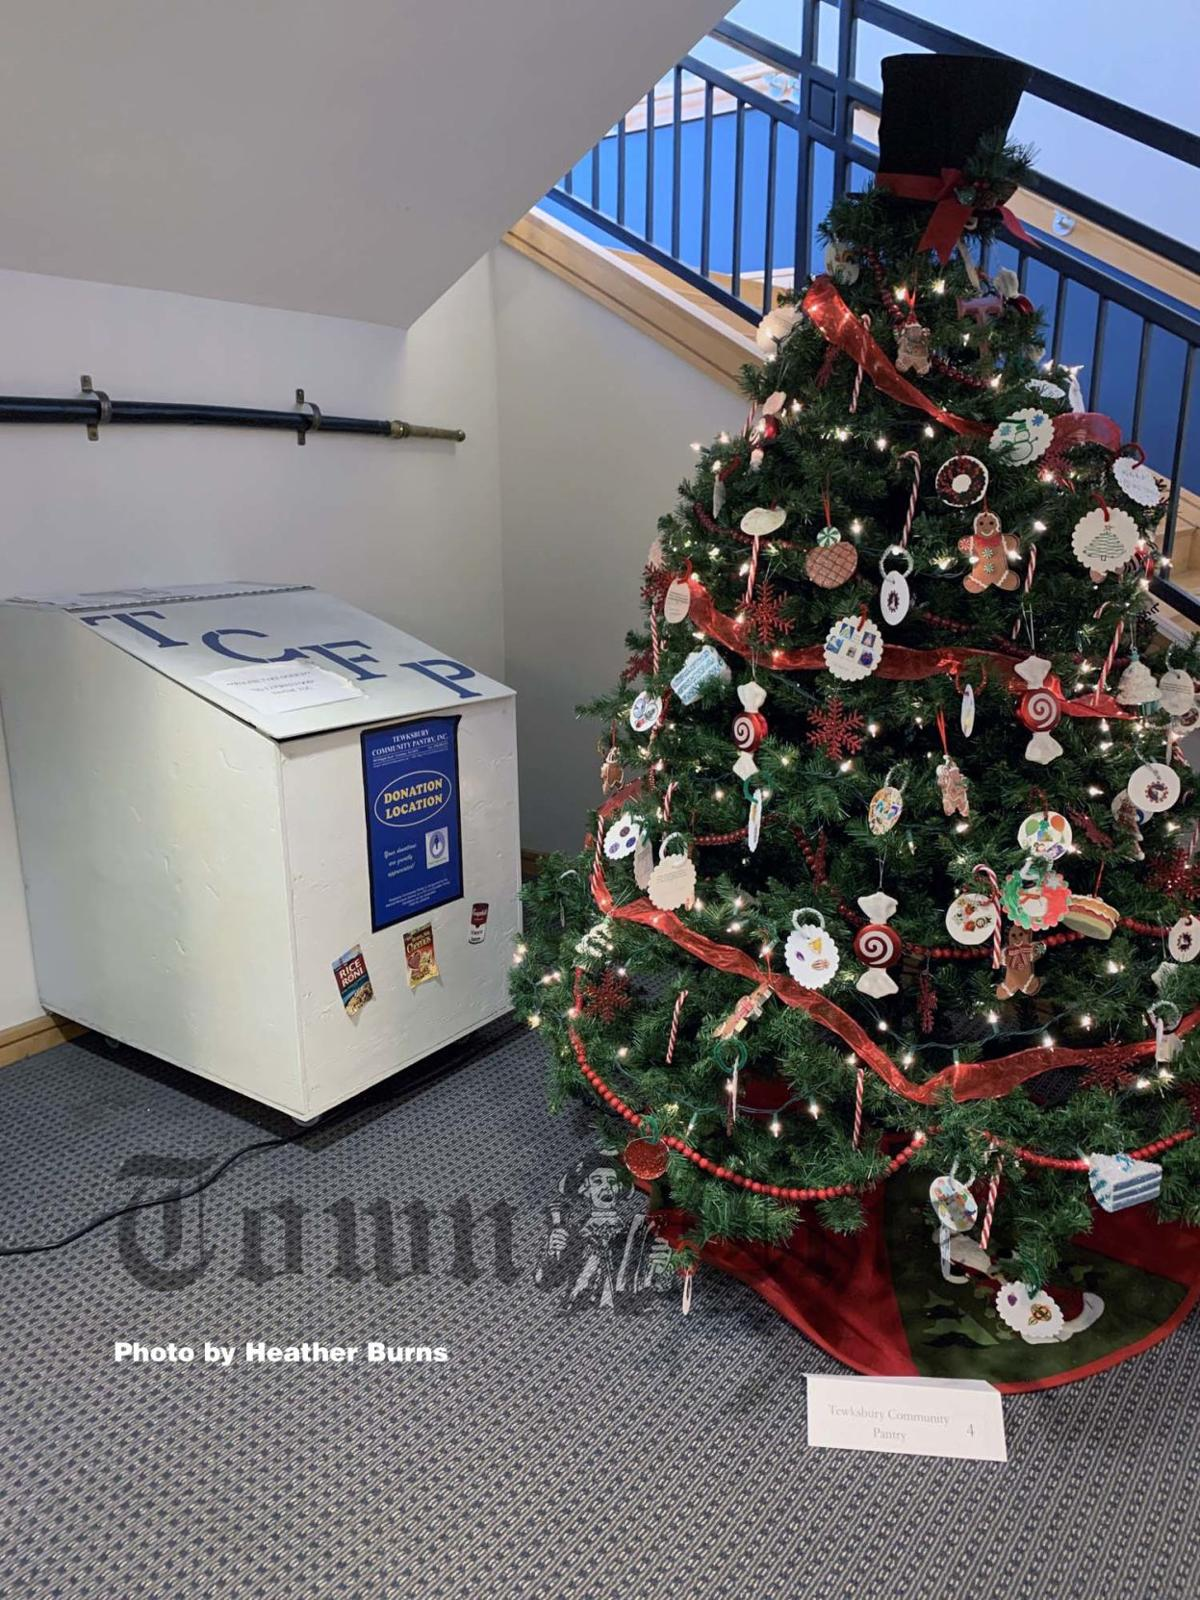 Tewksbury Community Pantry donation box